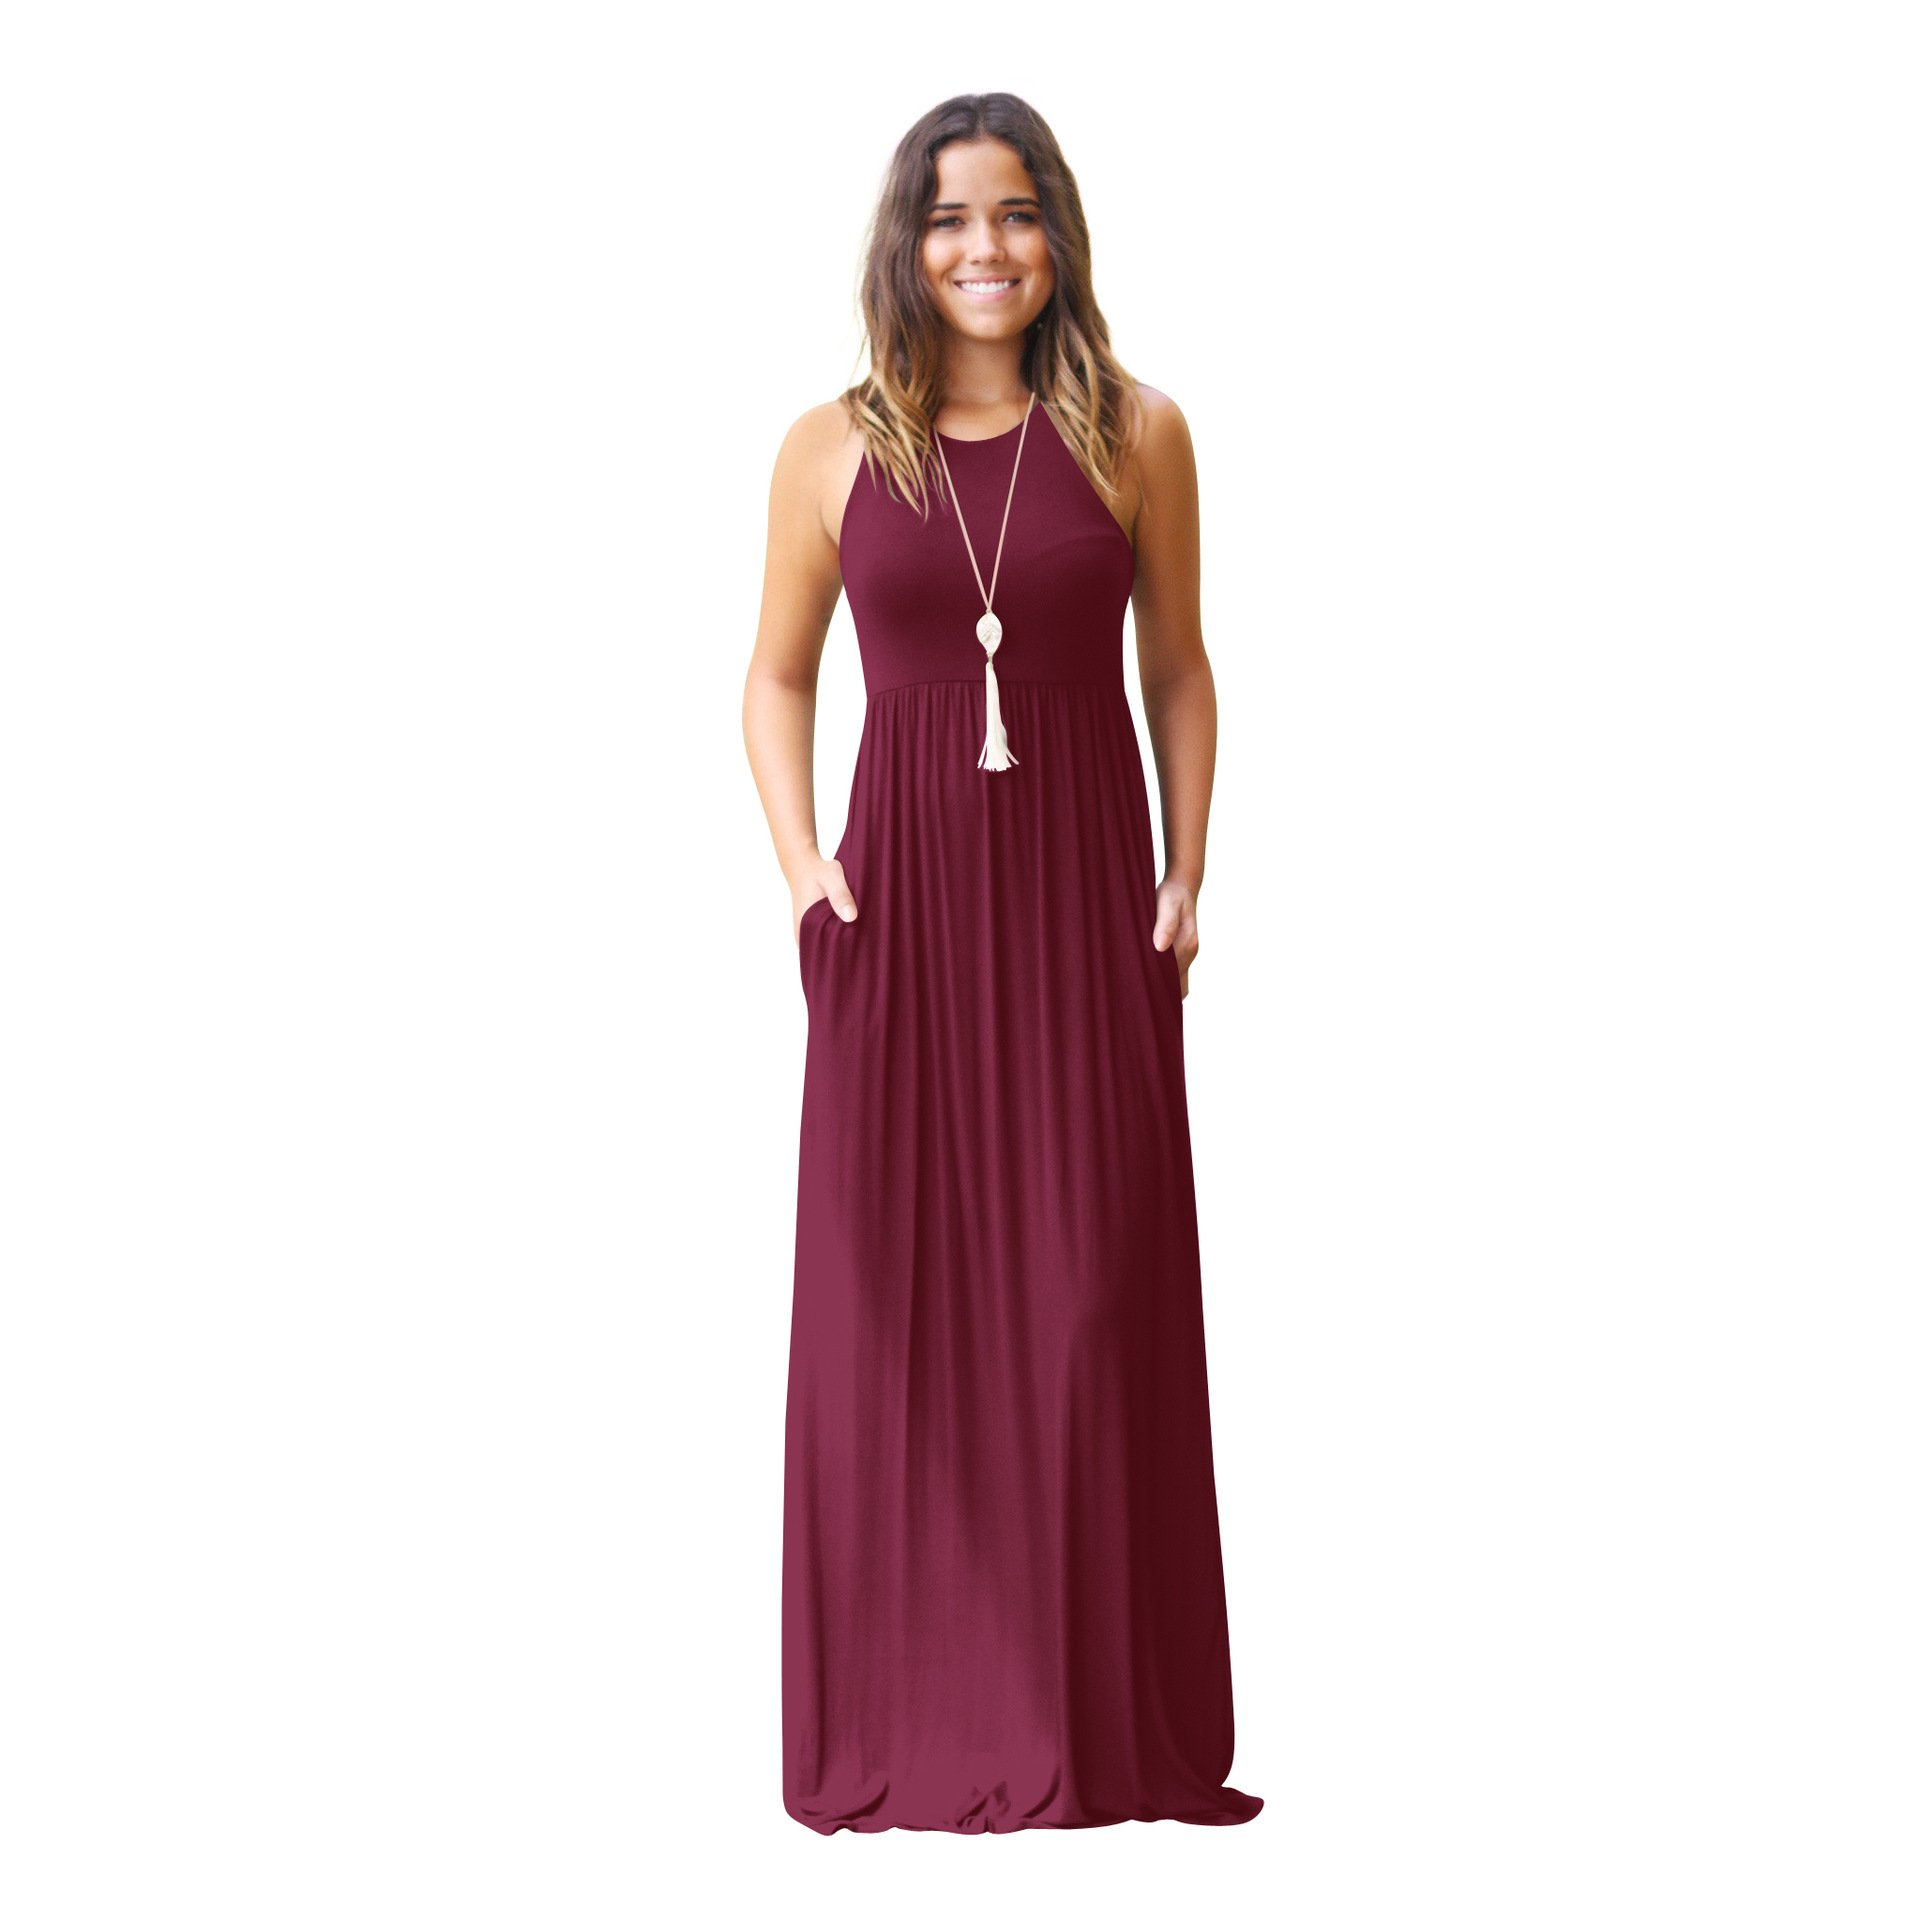 Alickson Fashion Women's Halter Sleeveless Maxi Dress Casual Long Skirts with Pockets